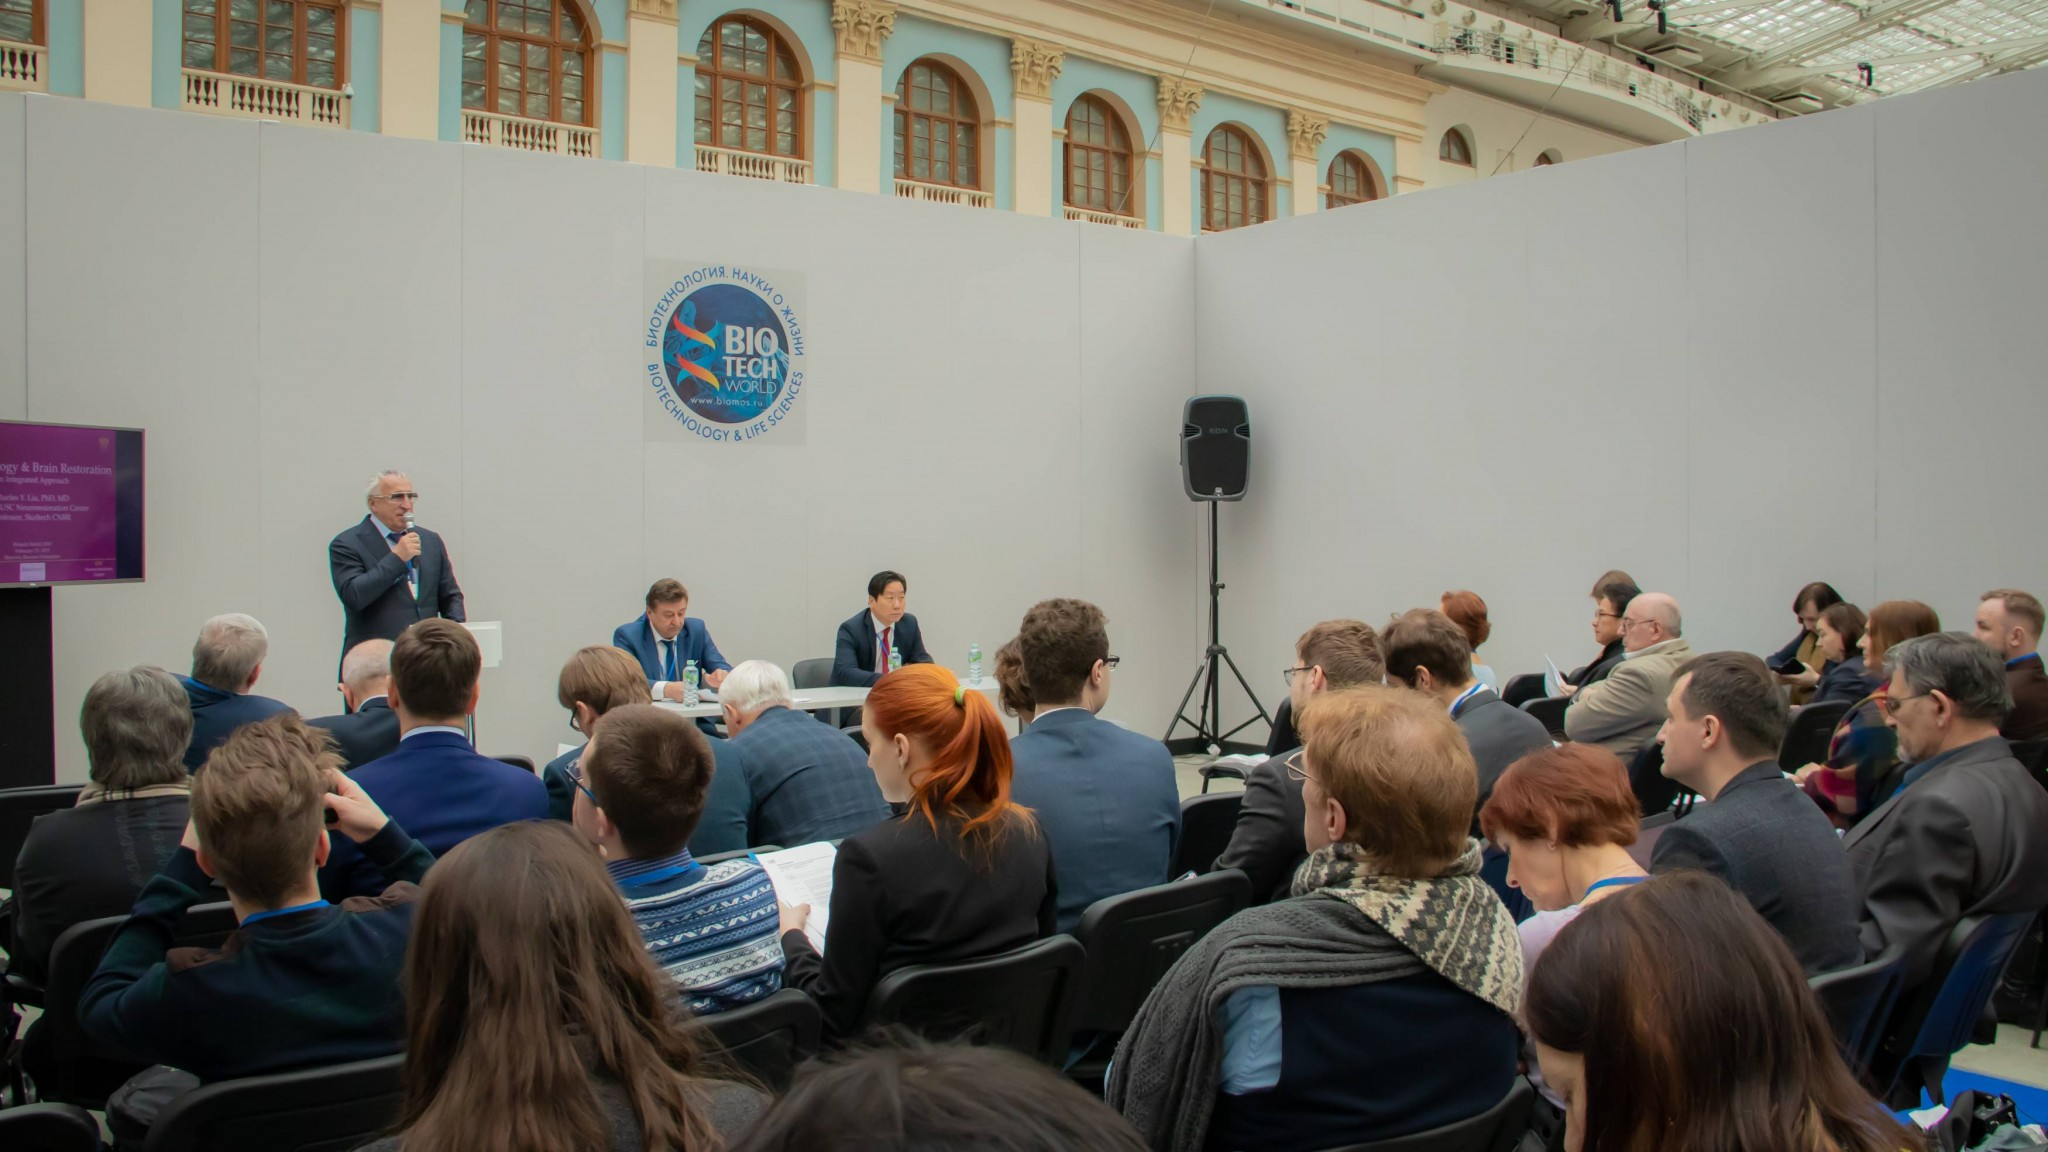 Roundtable talks, Biotech World (left to right): Professor Dmitry Tsyganov, Professor Charles Liu, and Skoltech President, Alexander Kuleshov